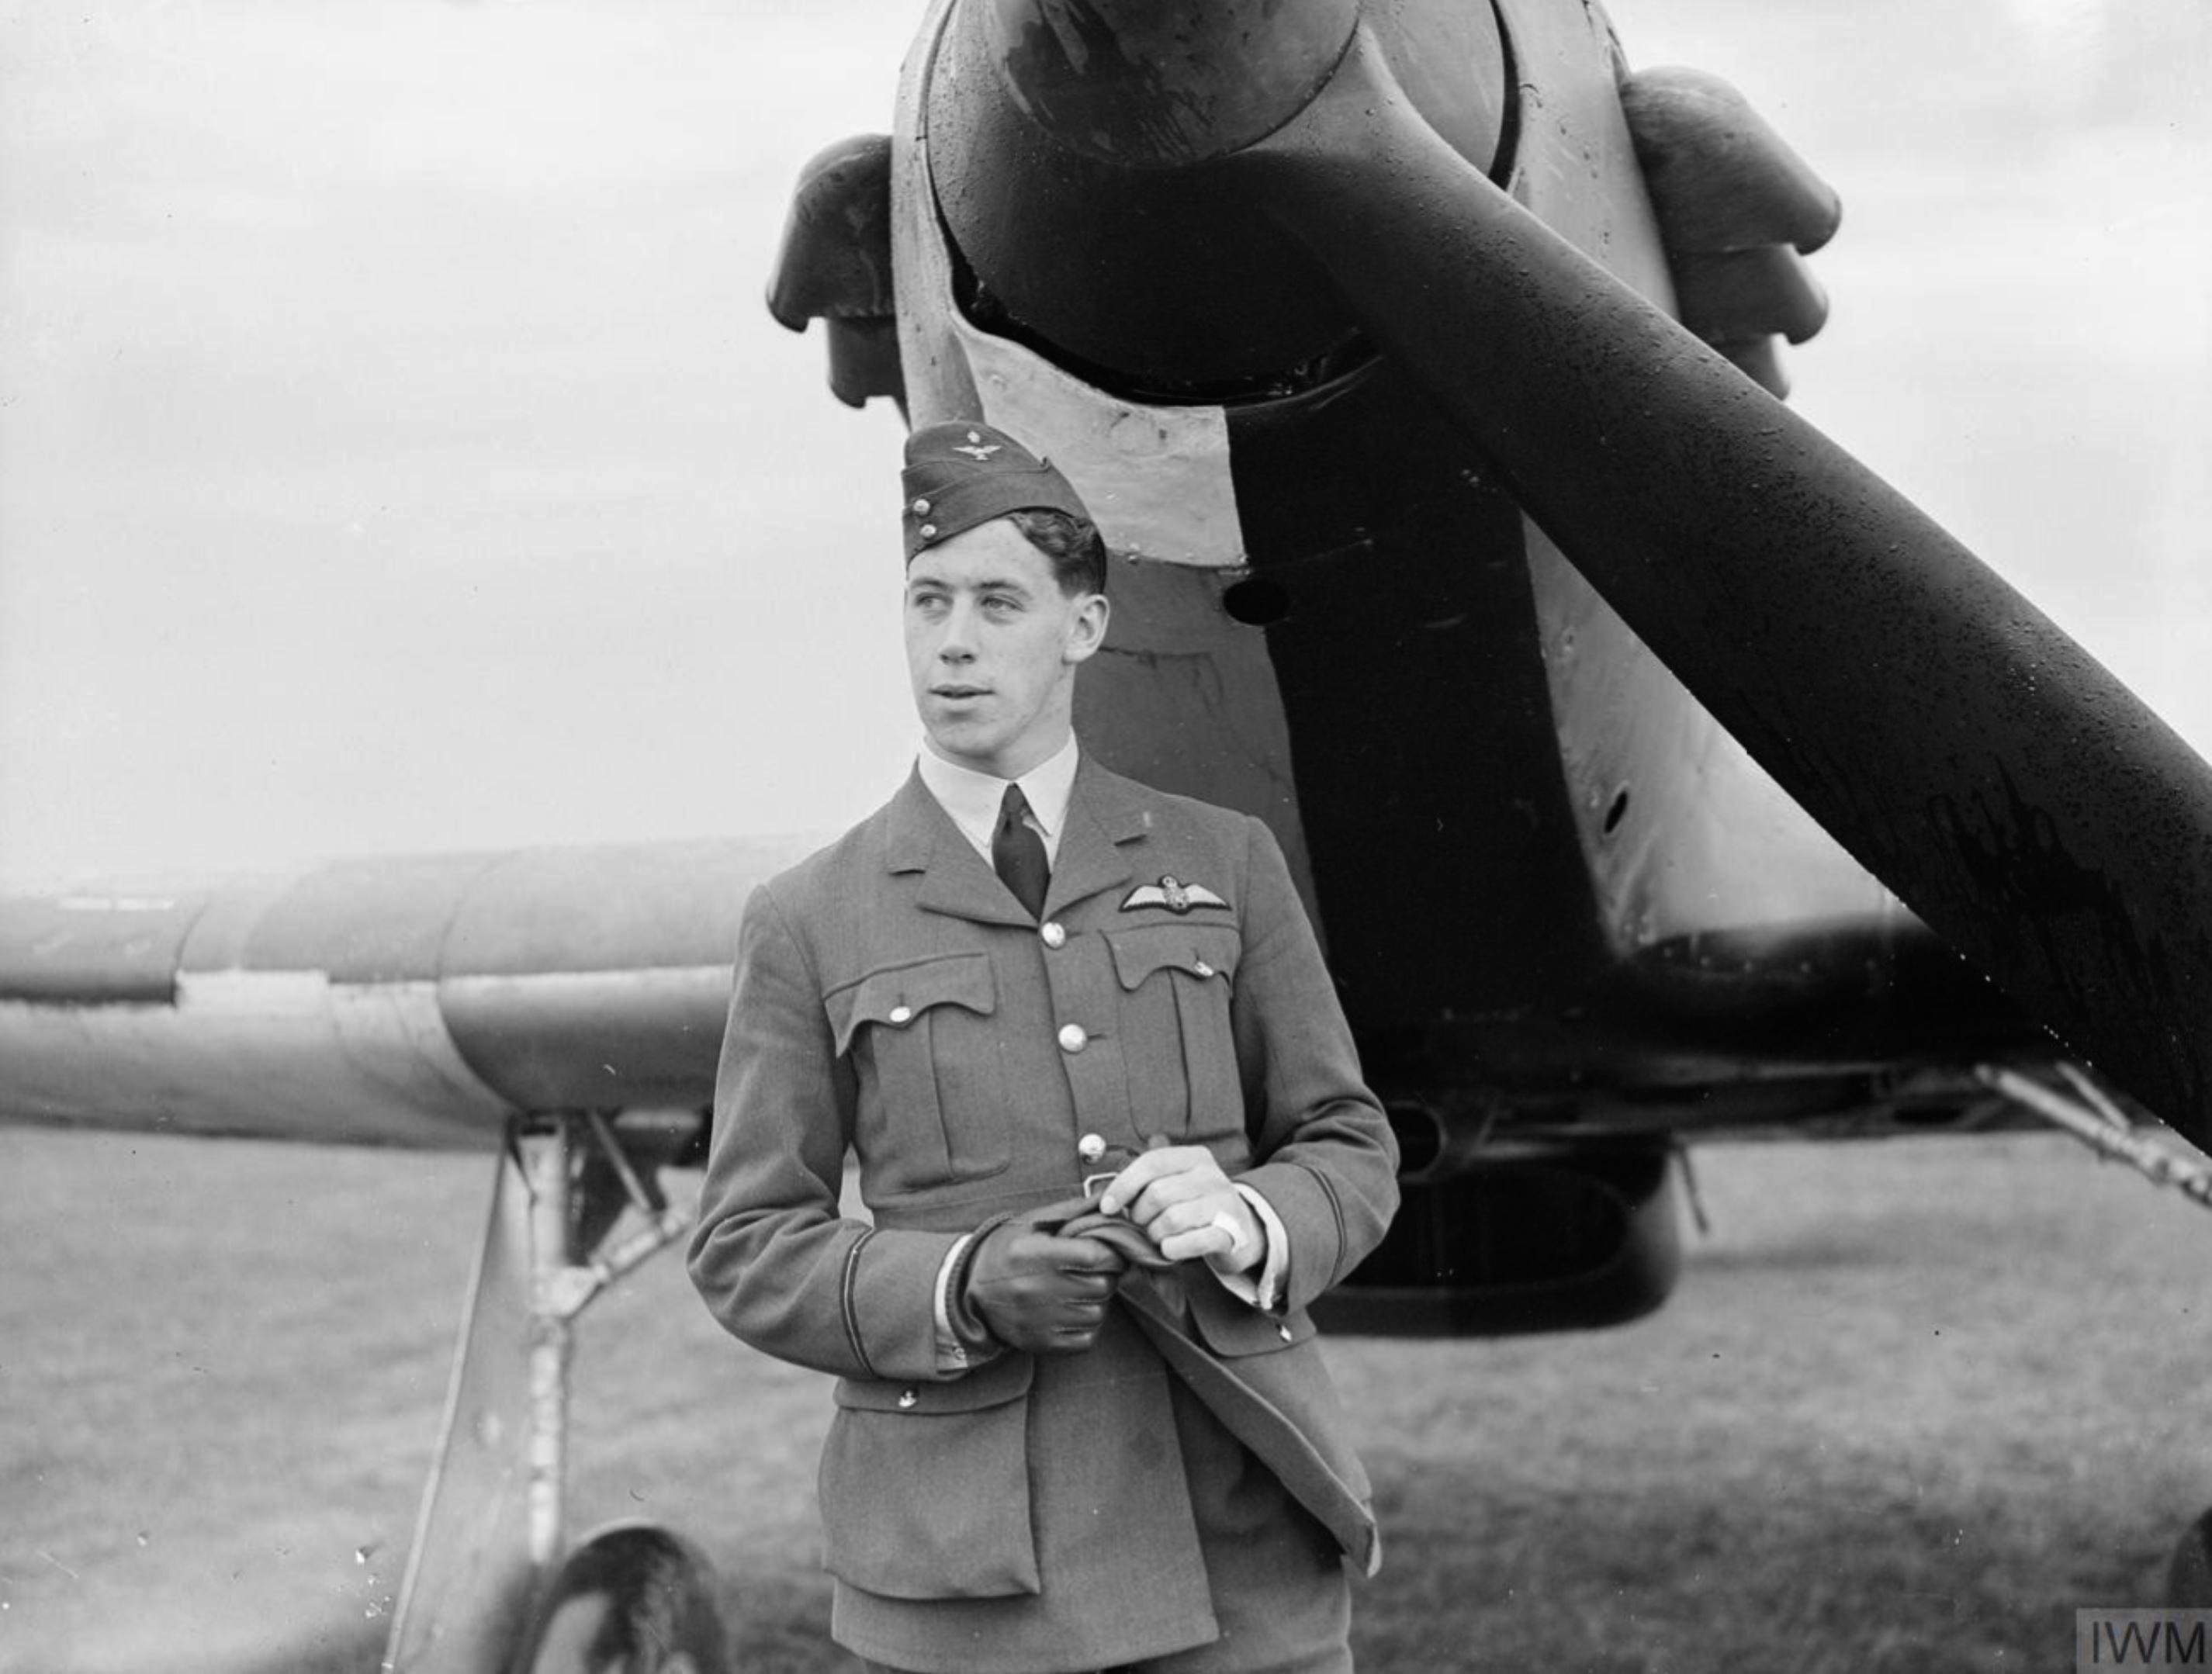 Hurricane I RAF 73Sqn P Paddy III flown by PO EJ Kain France 1940 IWM C1148